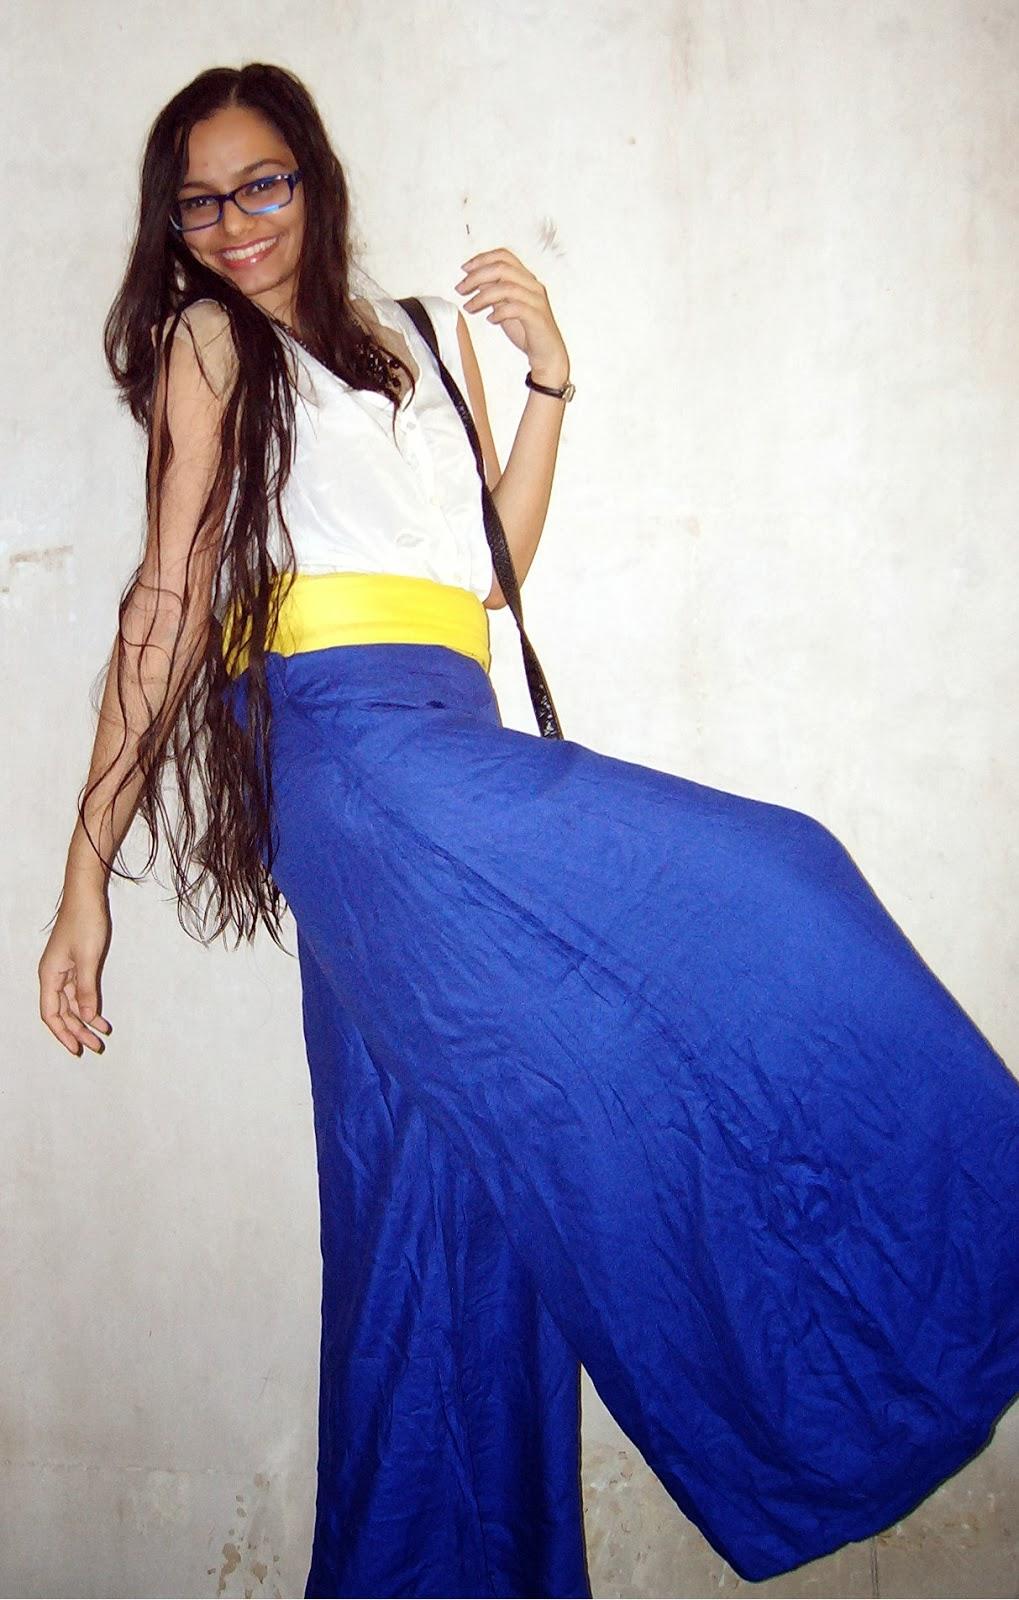 how to wear palazzos, street shopping, thrifty shopping, mumbai streetstyle, electric blue pants, oversized shirt, scarf